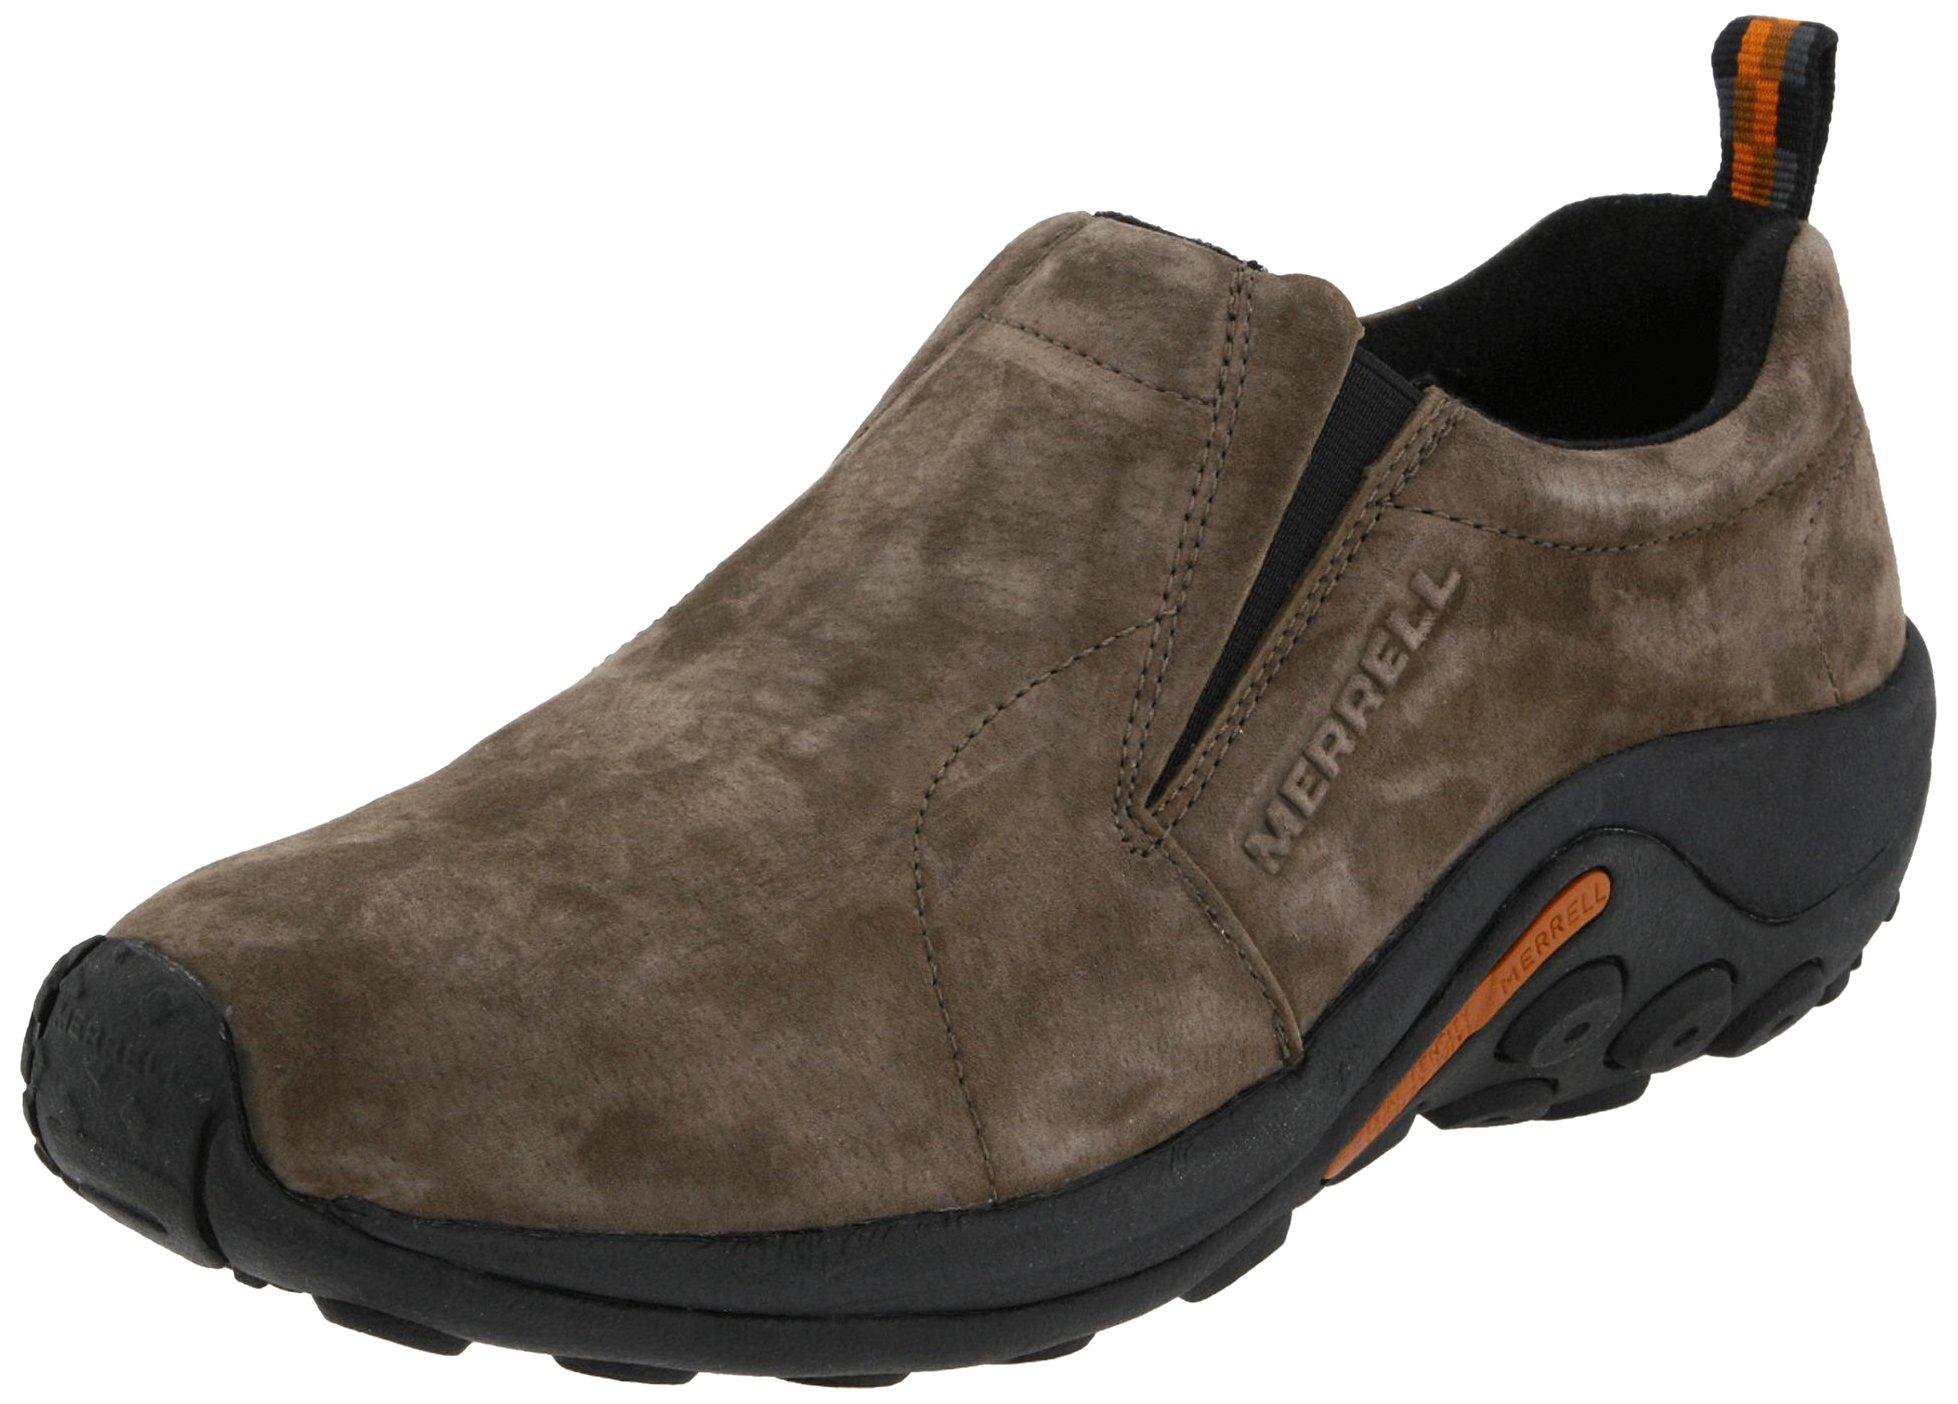 Merrell Men's Jungle Moc Slip On Shoes